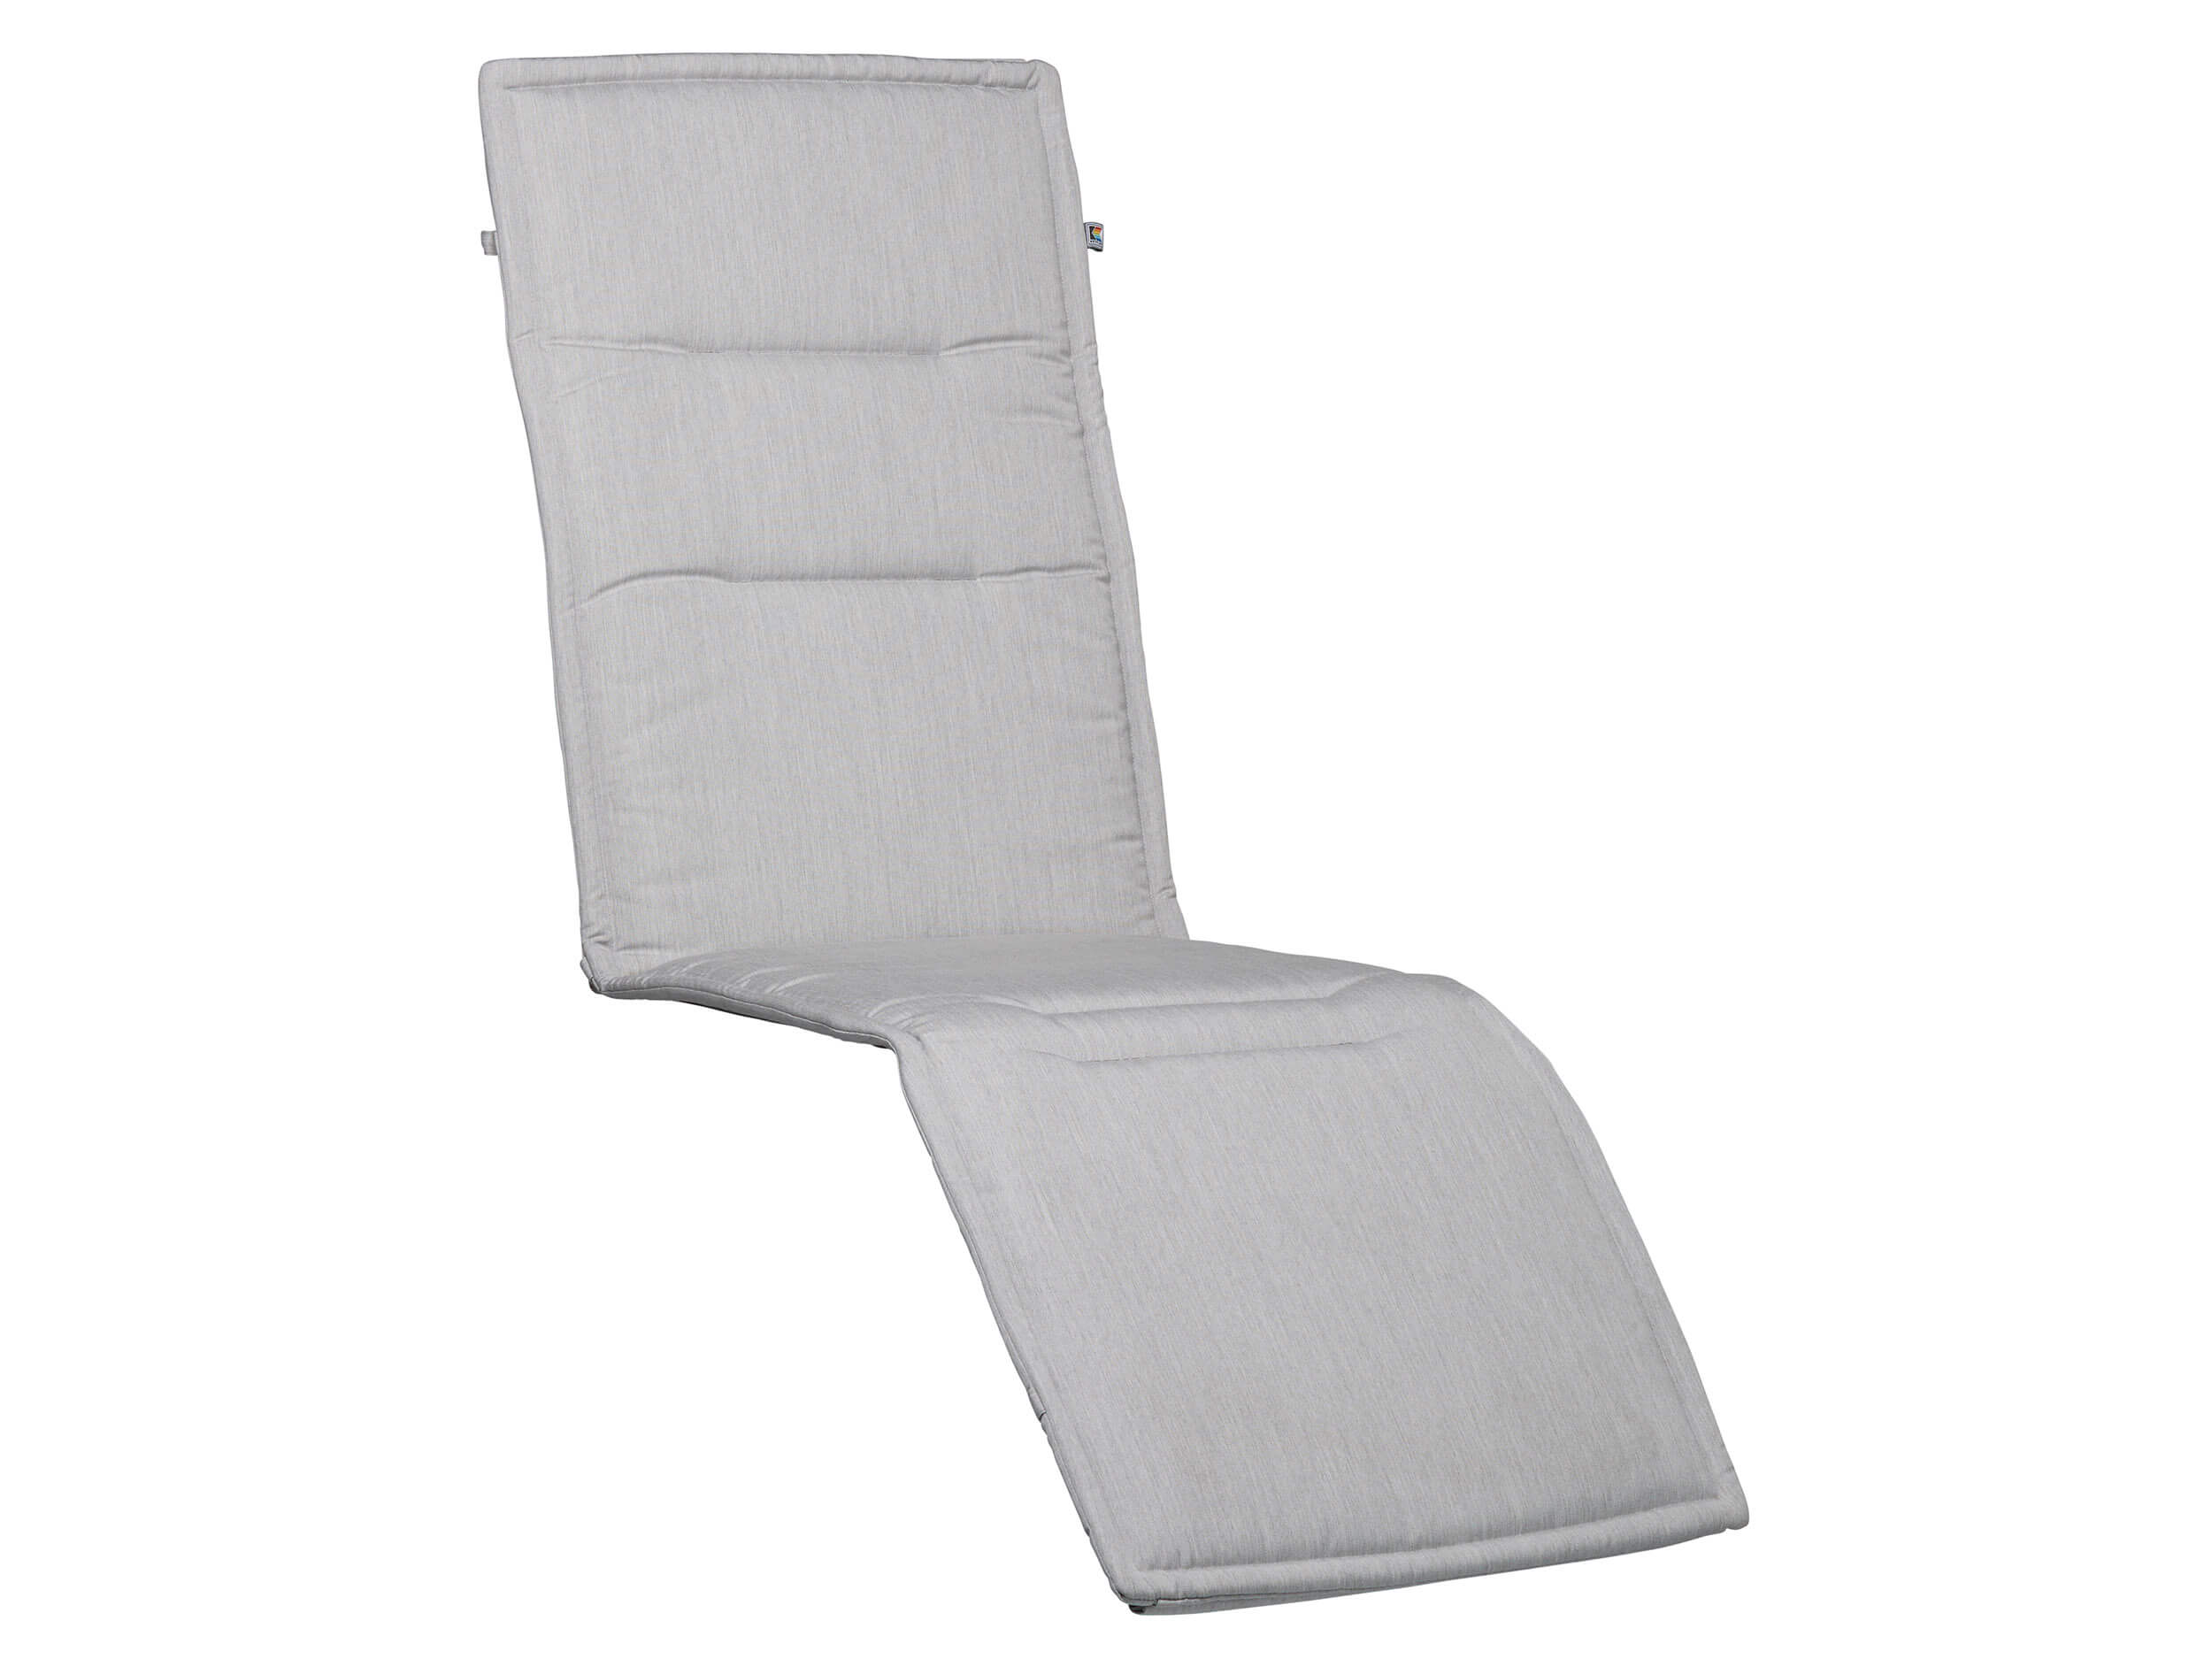 kettler relaxliege auflage f r lucca ii dessin 887. Black Bedroom Furniture Sets. Home Design Ideas